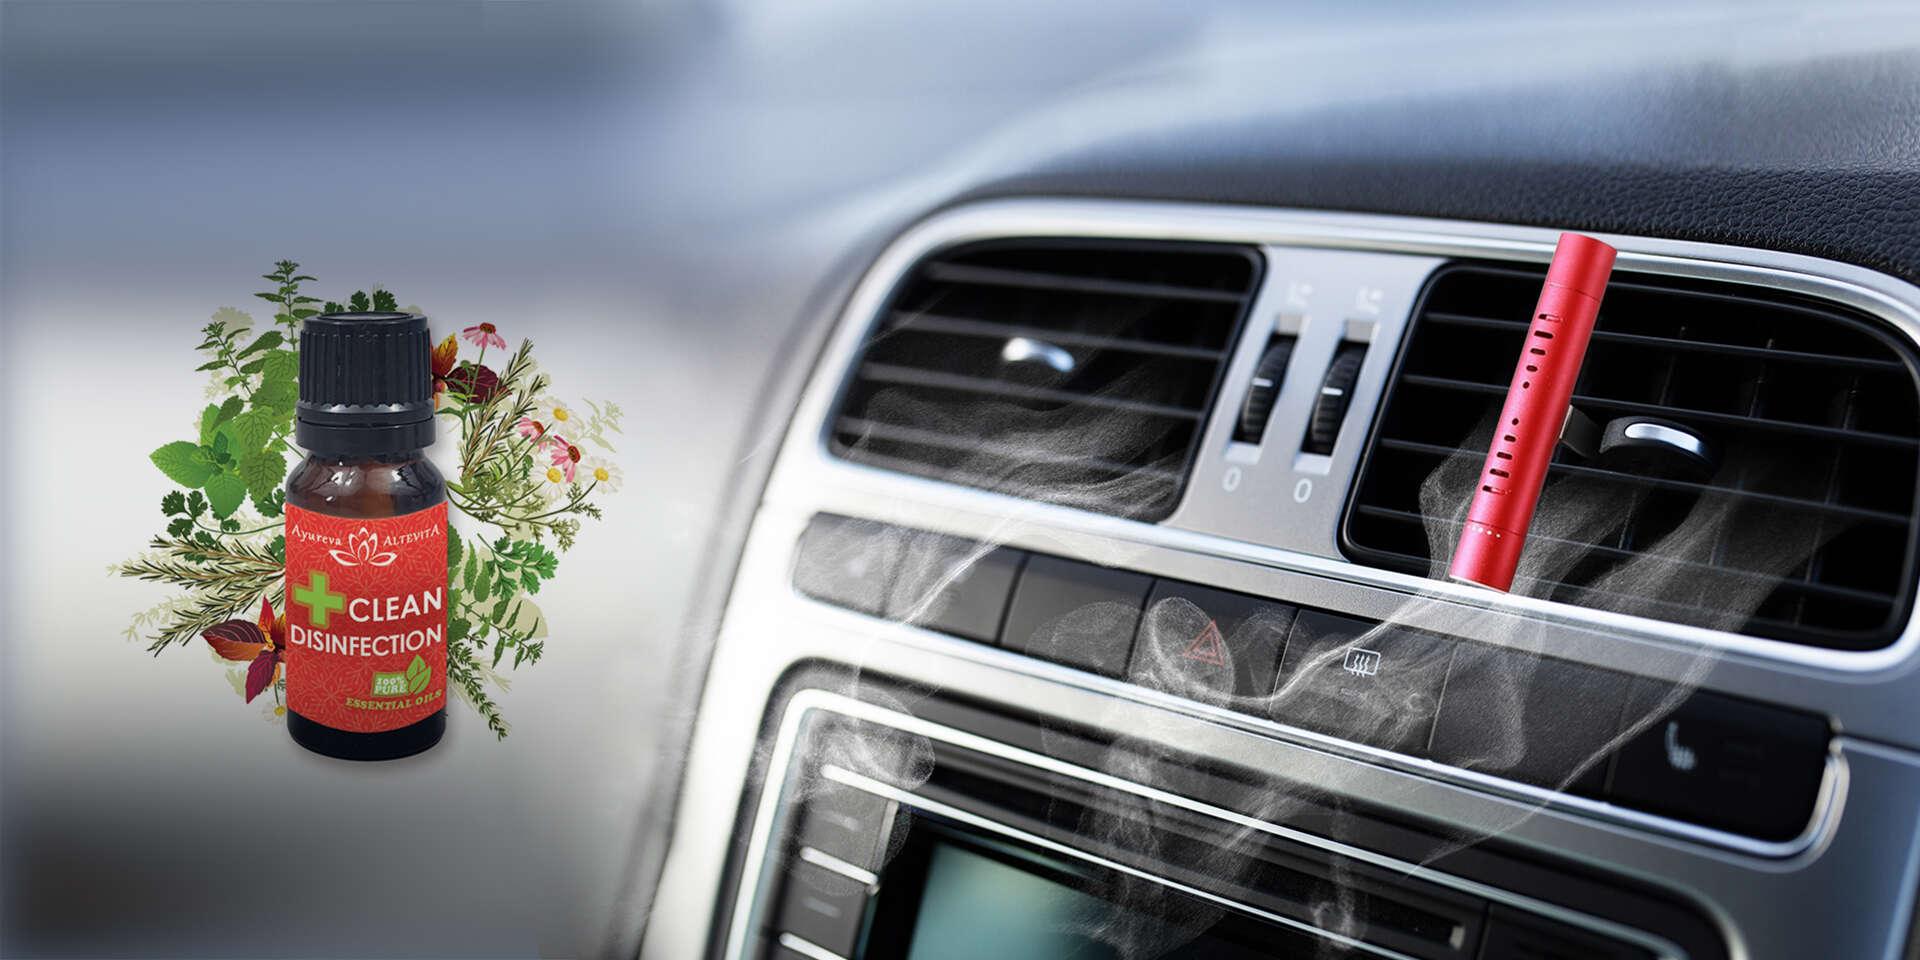 Aroma difuzér a olejček s dezinfekčným účinkom do auta